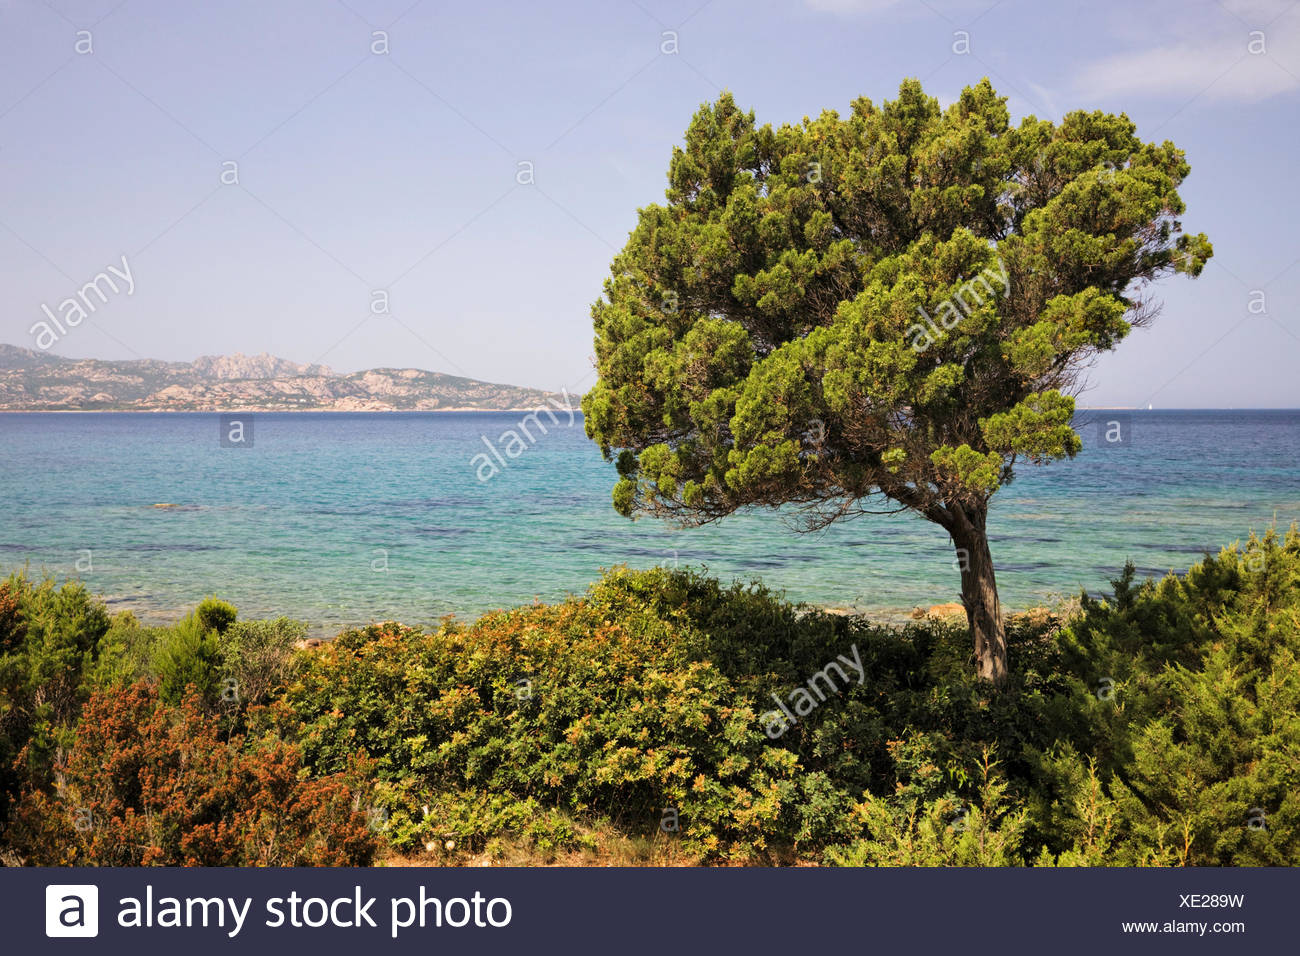 Tree on the northeast coast of Sardinia, Italy, Europe - Stock Image